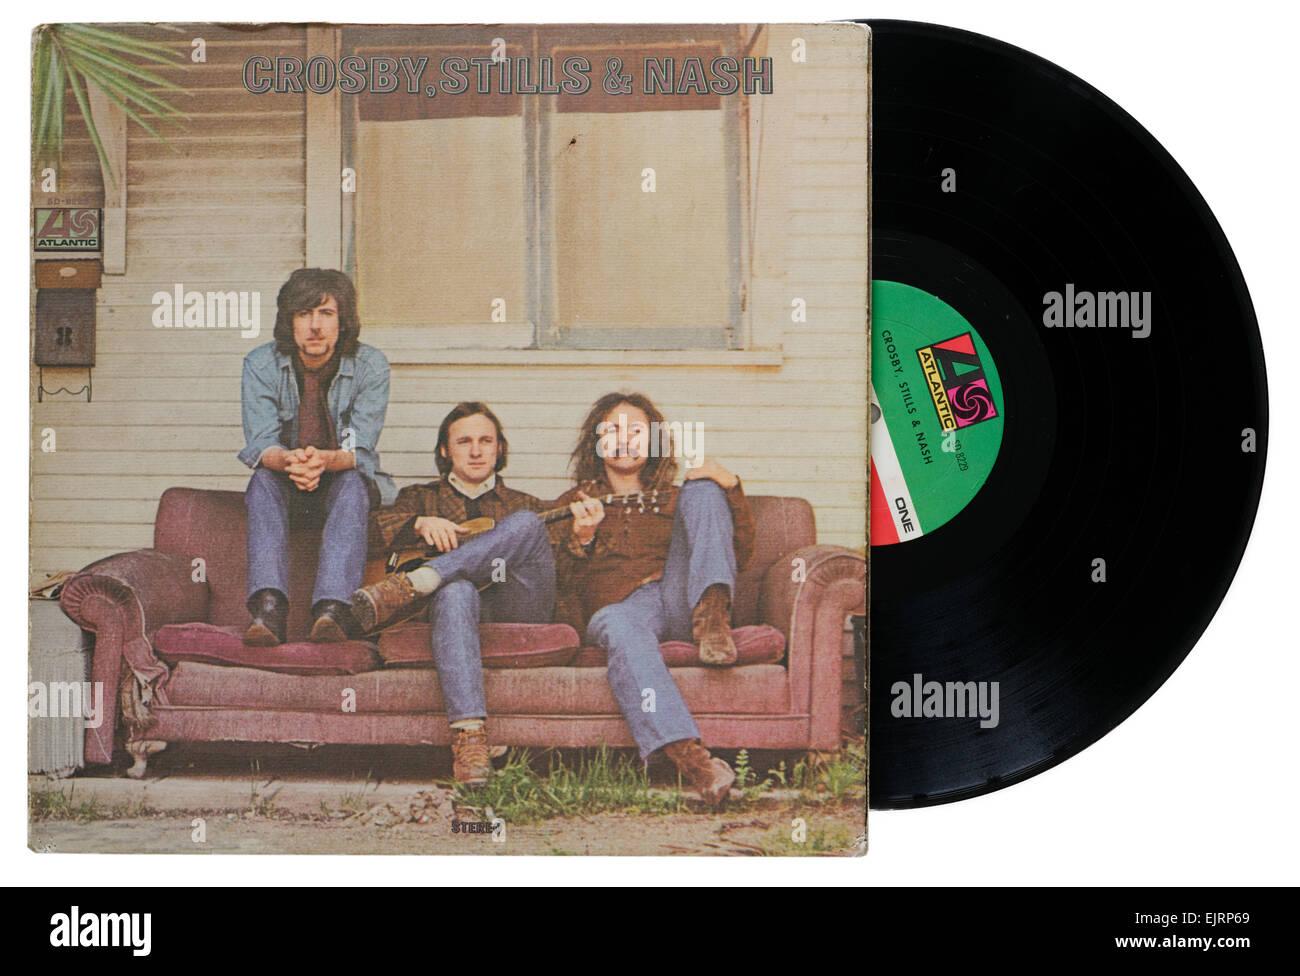 Crosby Stills and Nash debut album - Stock Image